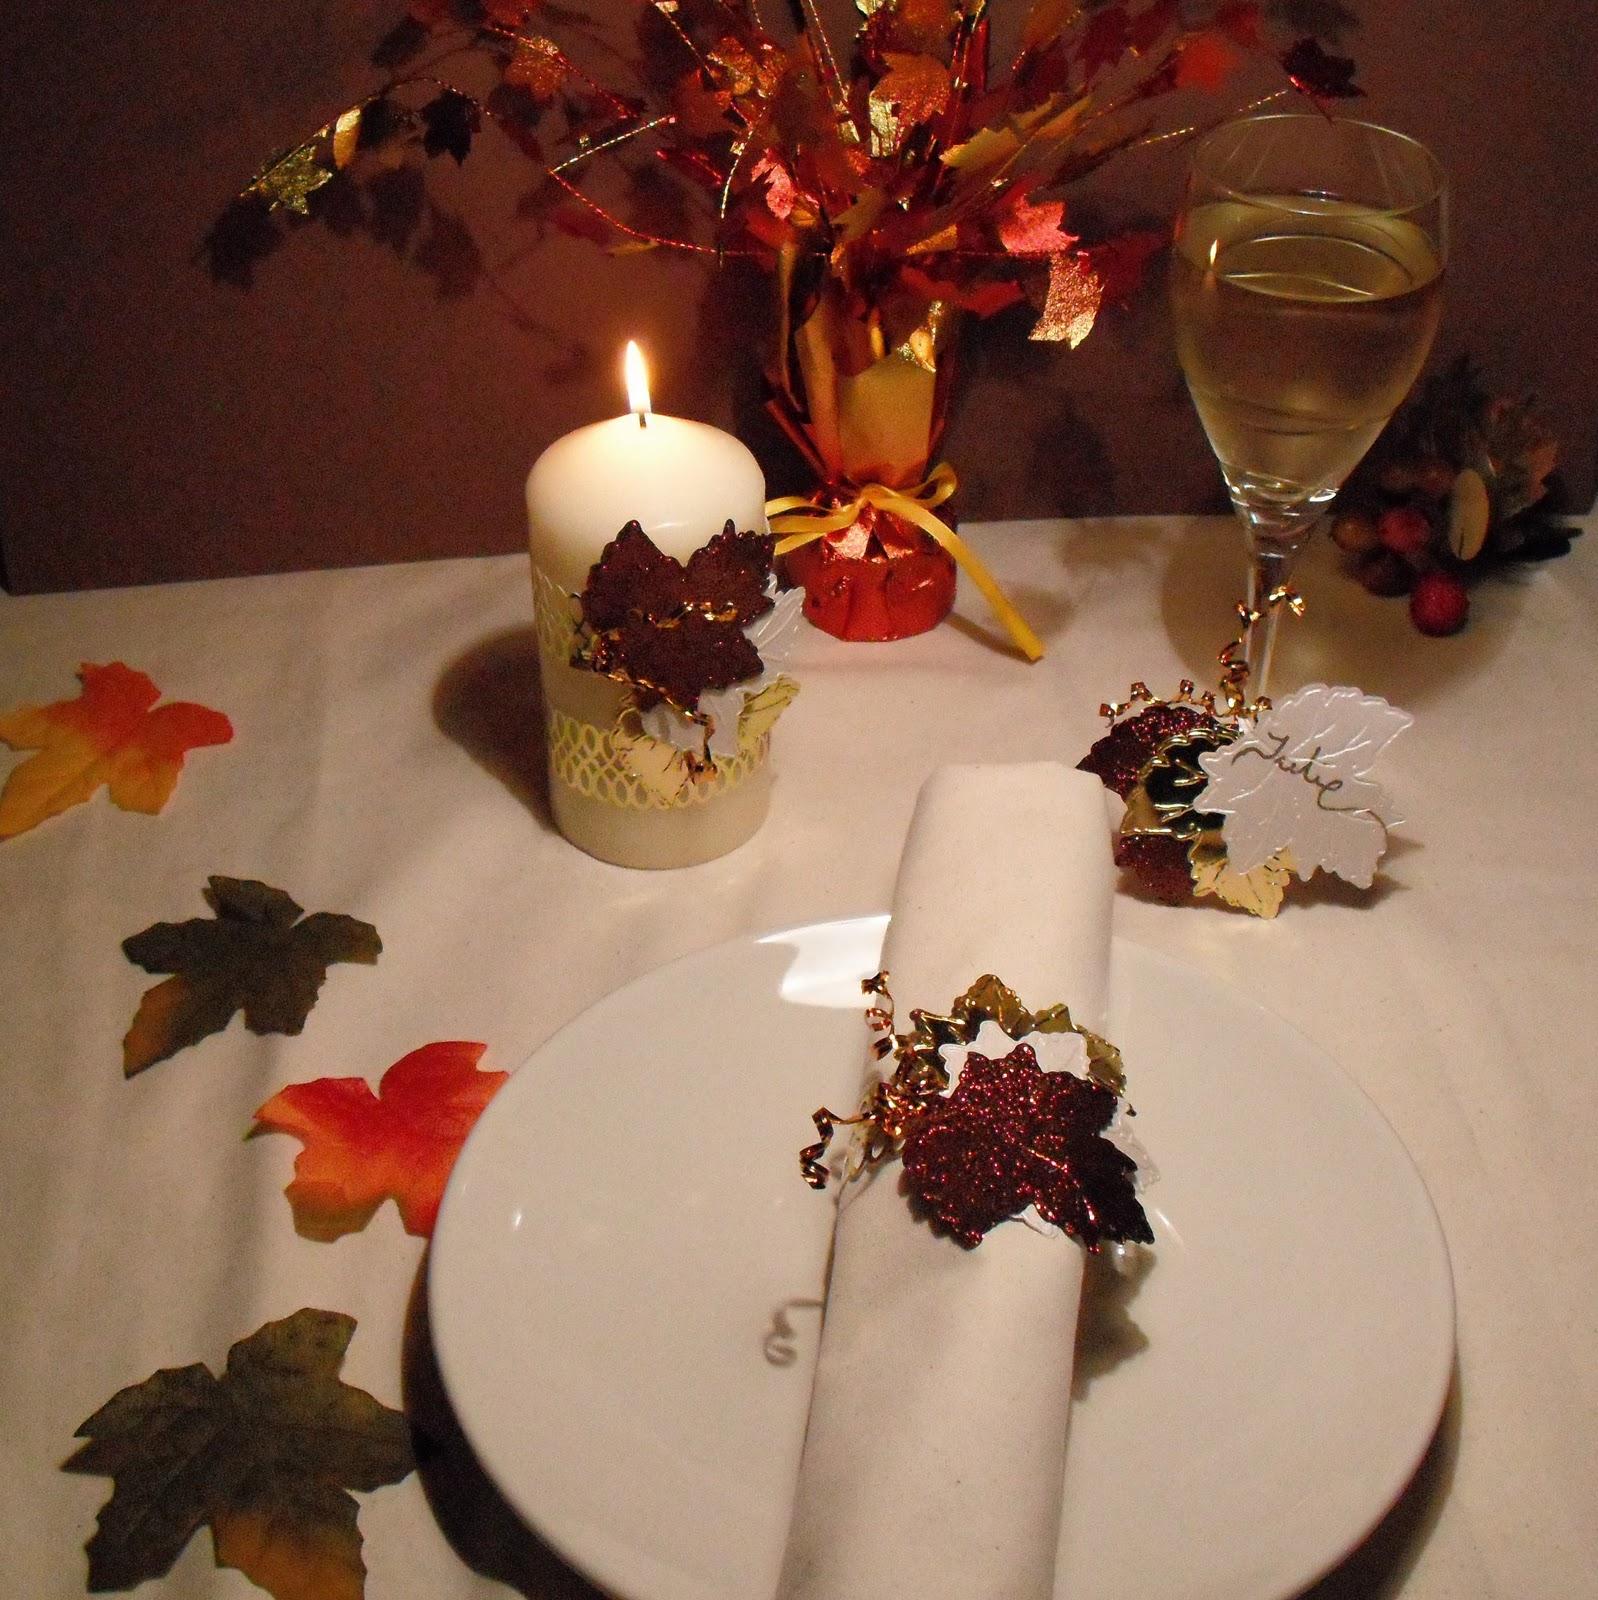 huxtershouse cuttlebugspot thanksgiving table decor. Black Bedroom Furniture Sets. Home Design Ideas